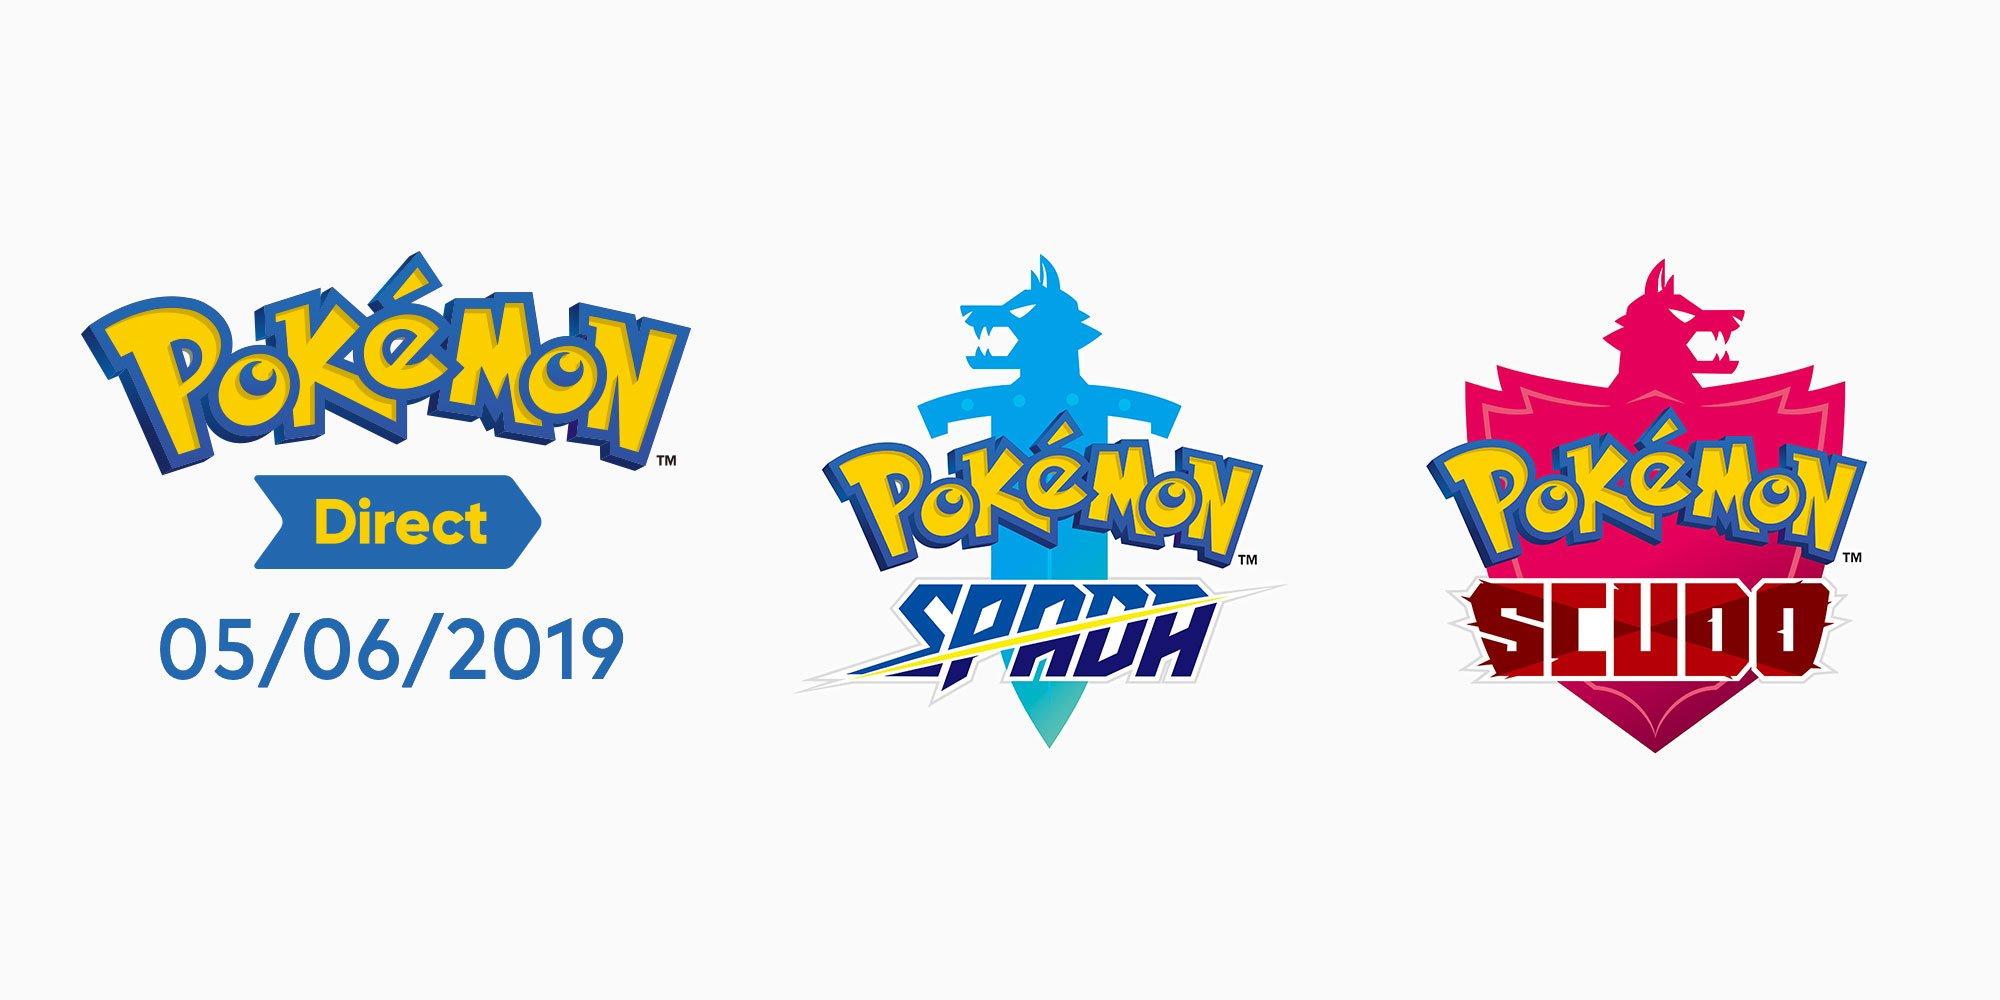 Pokémon Direct: in arrivo novità per Pokémon Spada e Scudo thumbnail